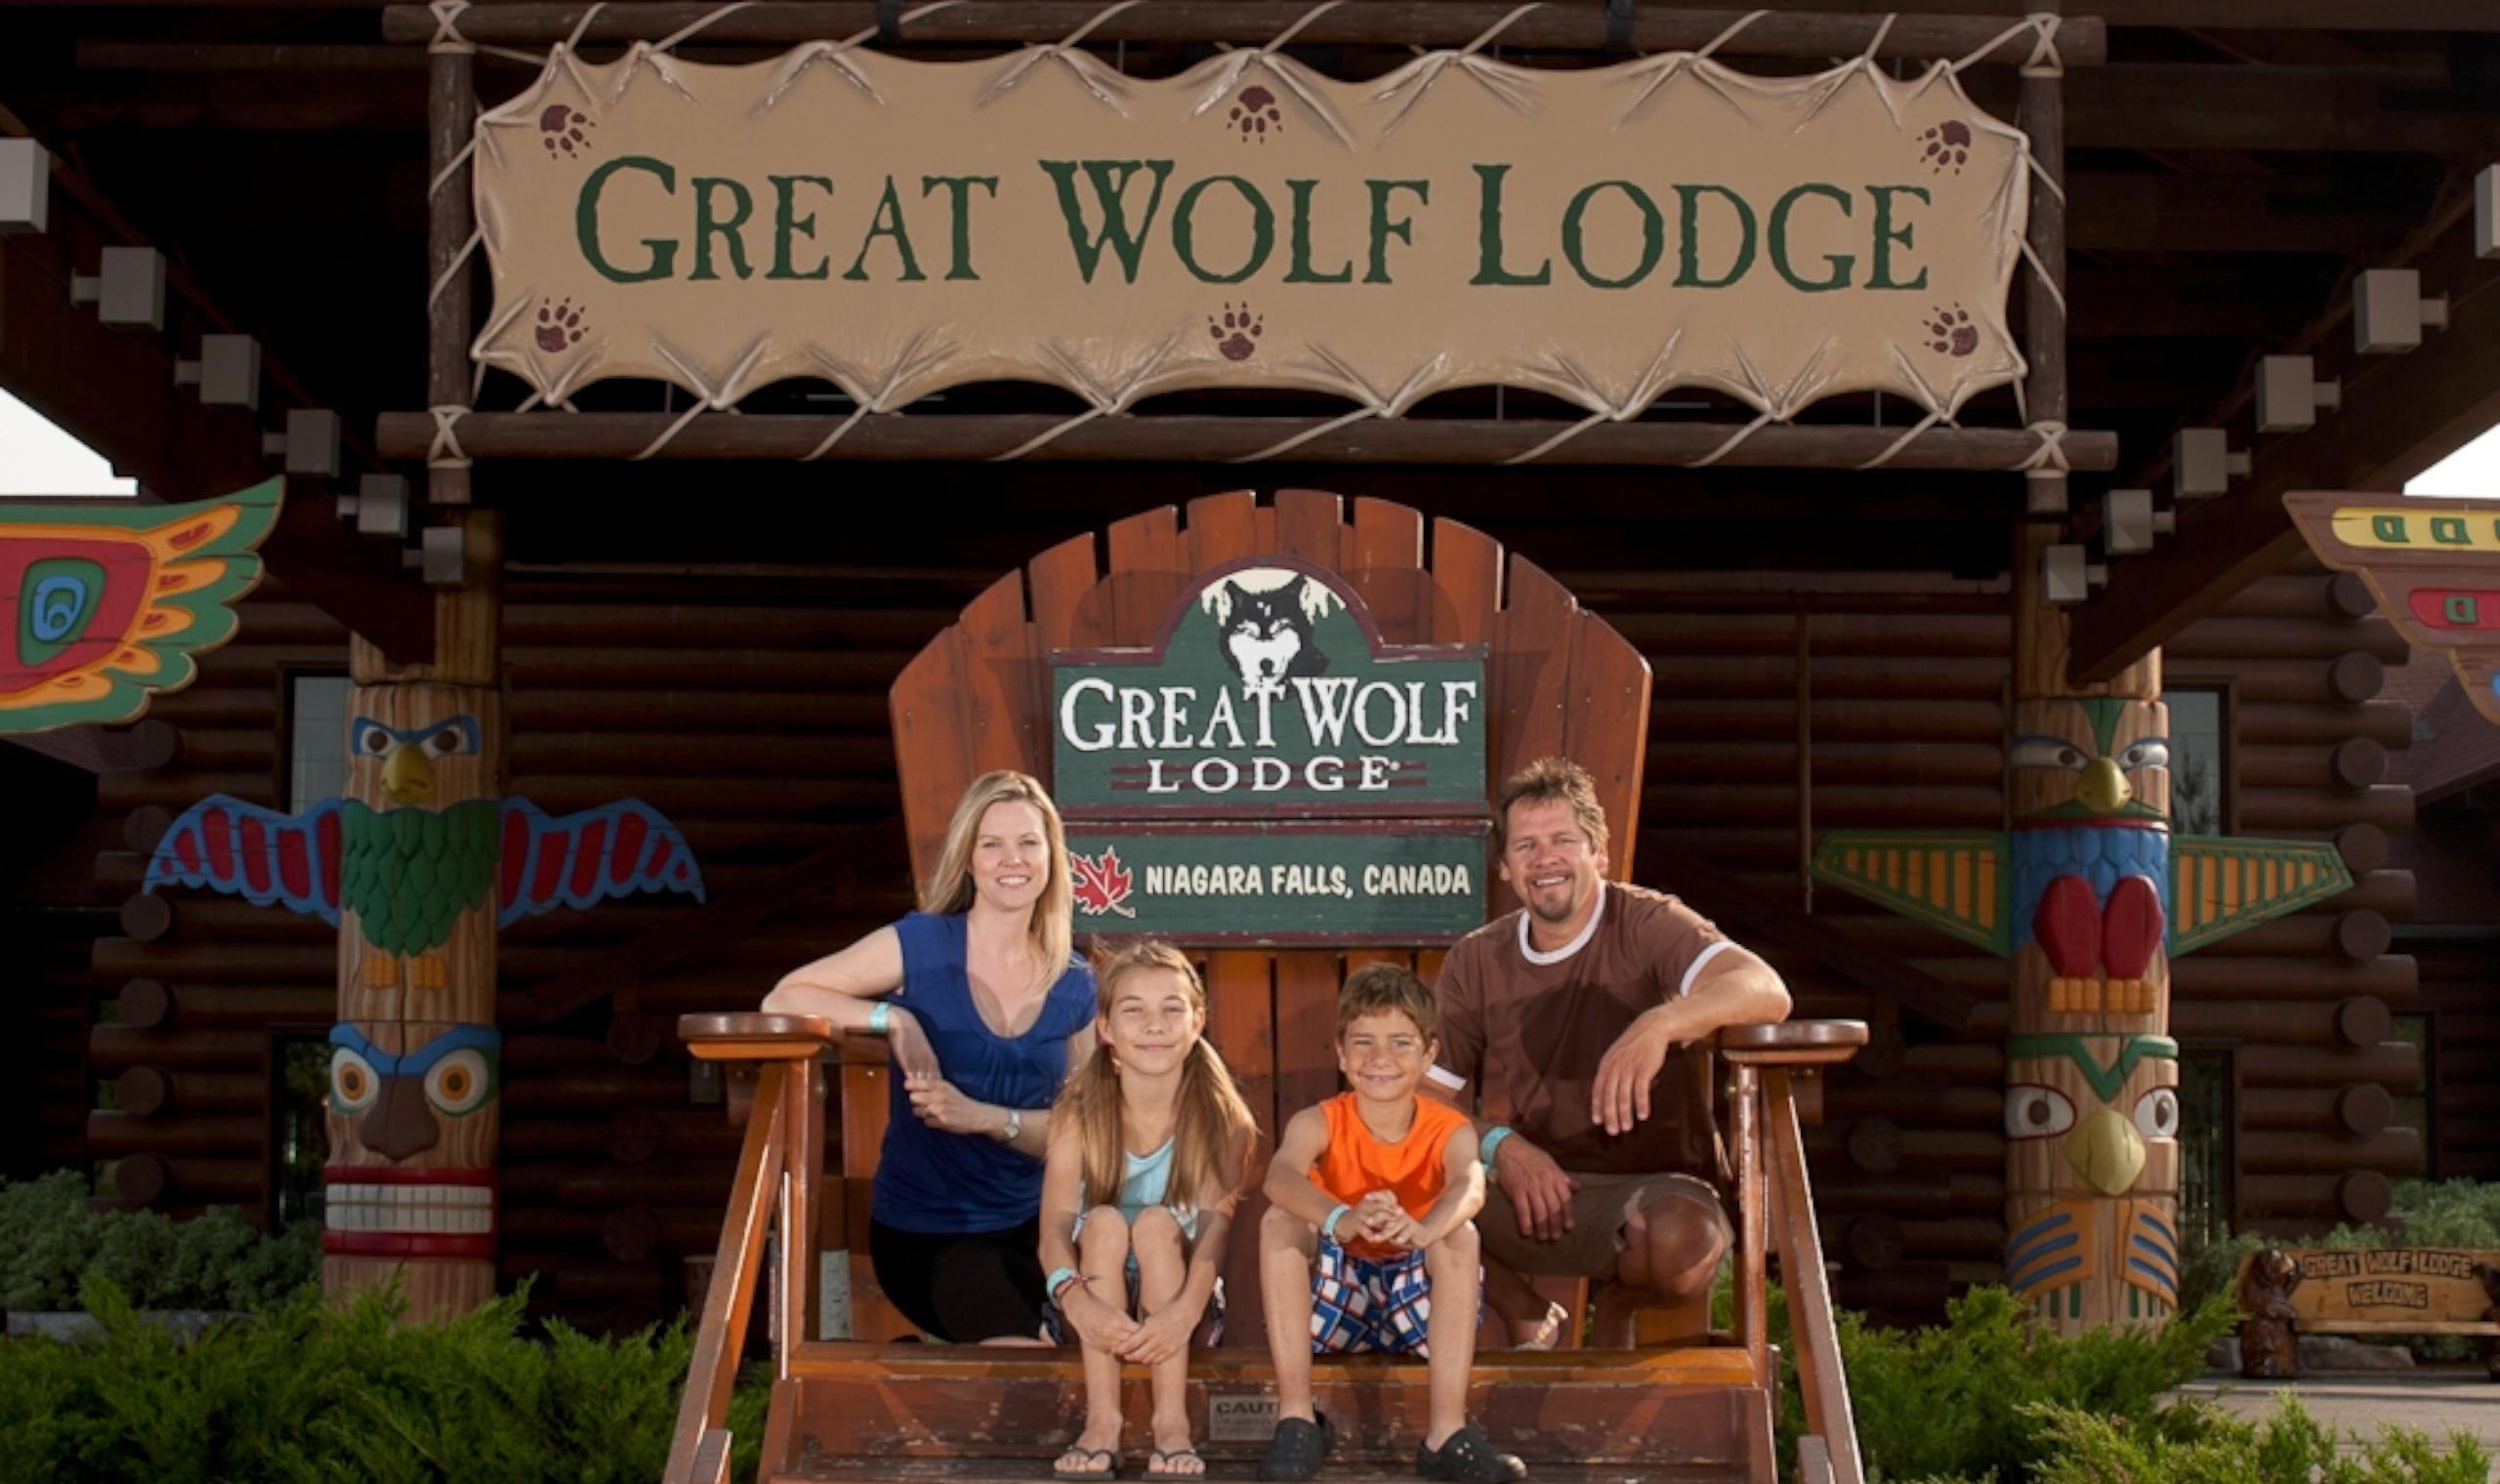 Niagara Falls Hotels >> Great Wolf Lodge - Niagara Falls | Canadian Affair